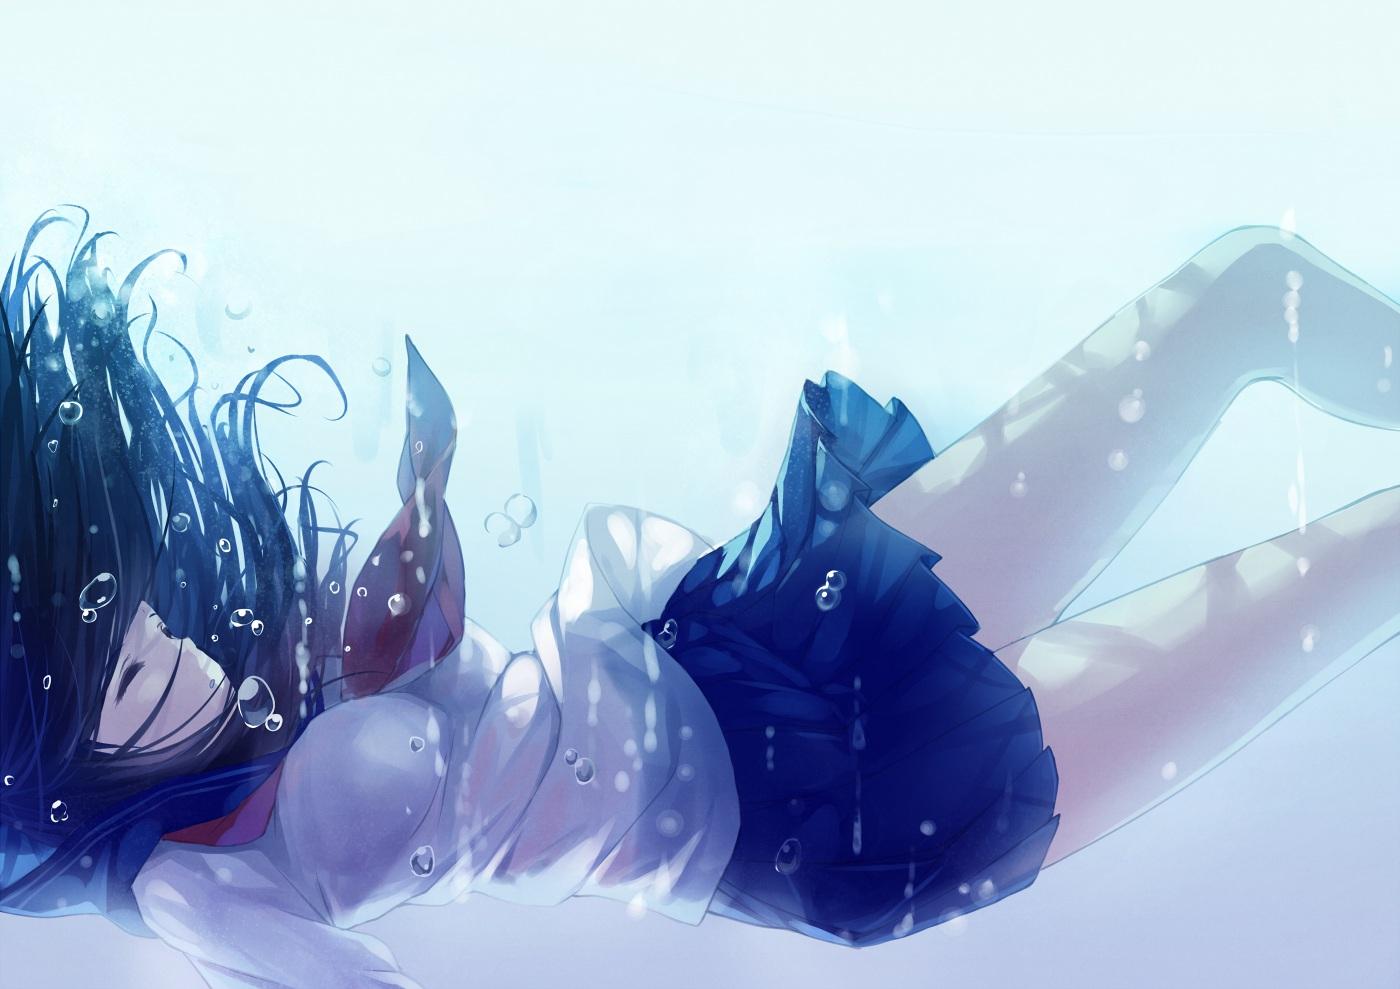 black_hair bubbles caidychen long_hair original school_uniform skirt sleeping tie underwater water